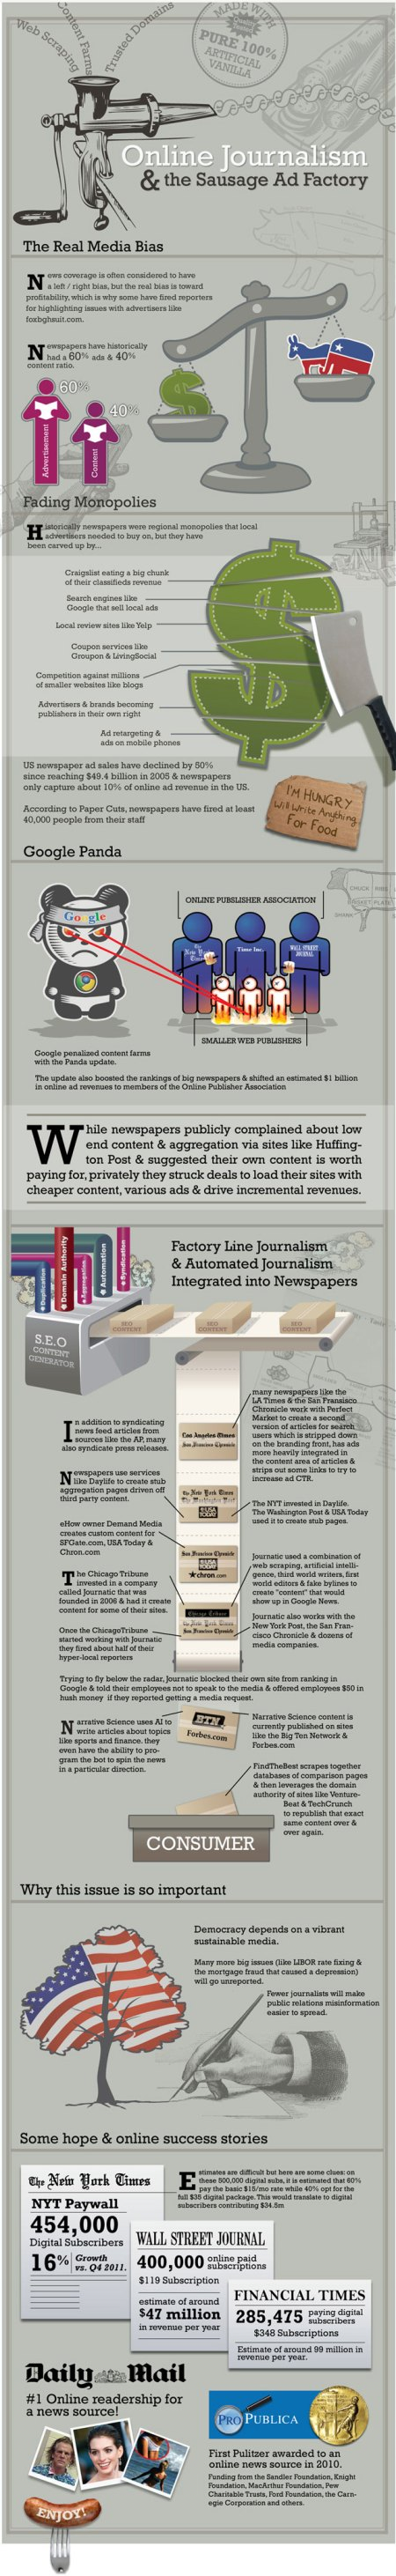 Online Journalism & Sausage Factories.